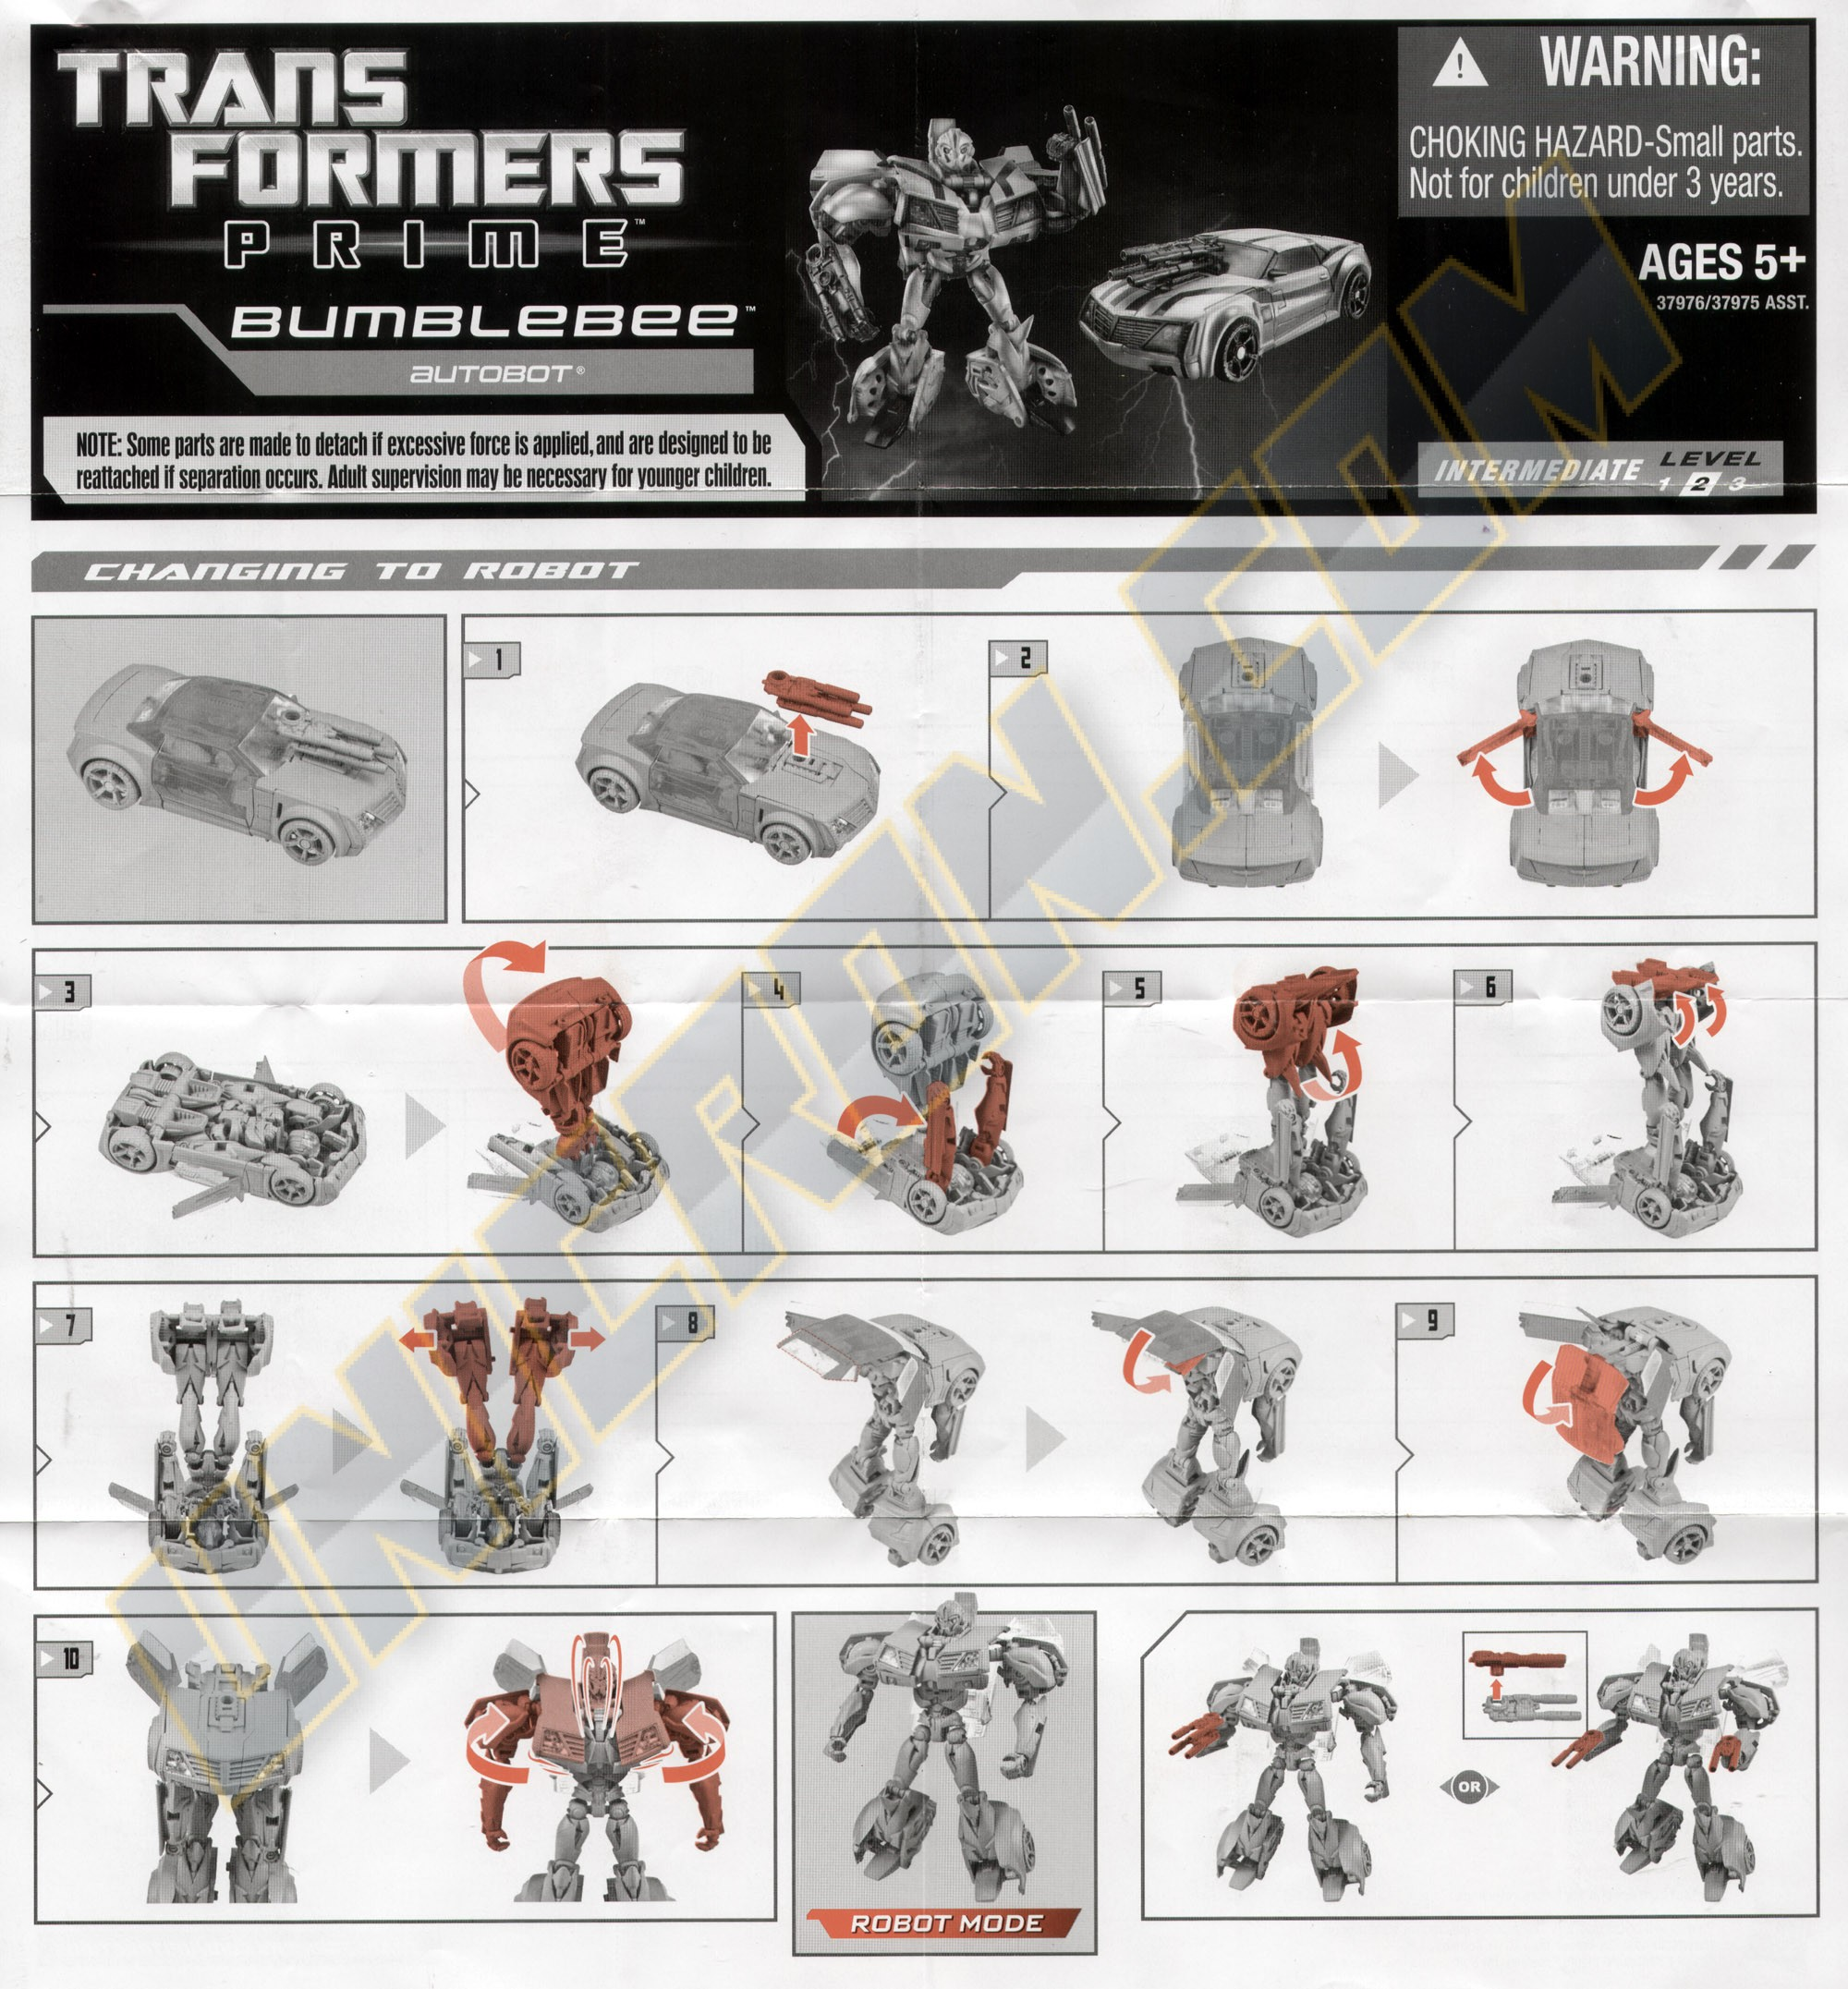 Transformers (movie) bumblebee (ultimate) transformers.